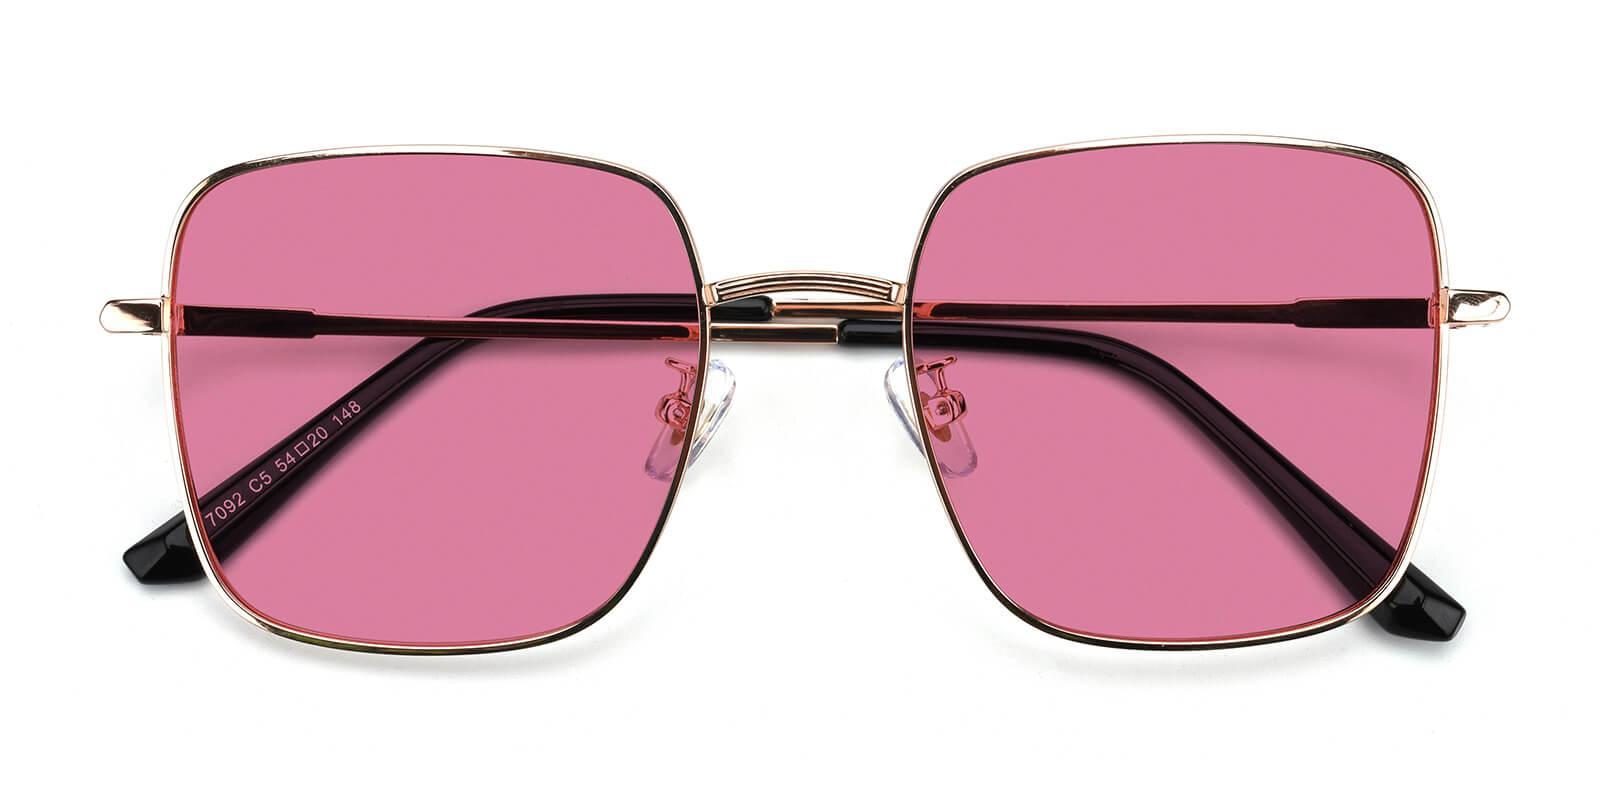 Noun-Gold-Square-Metal-Sunglasses-detail